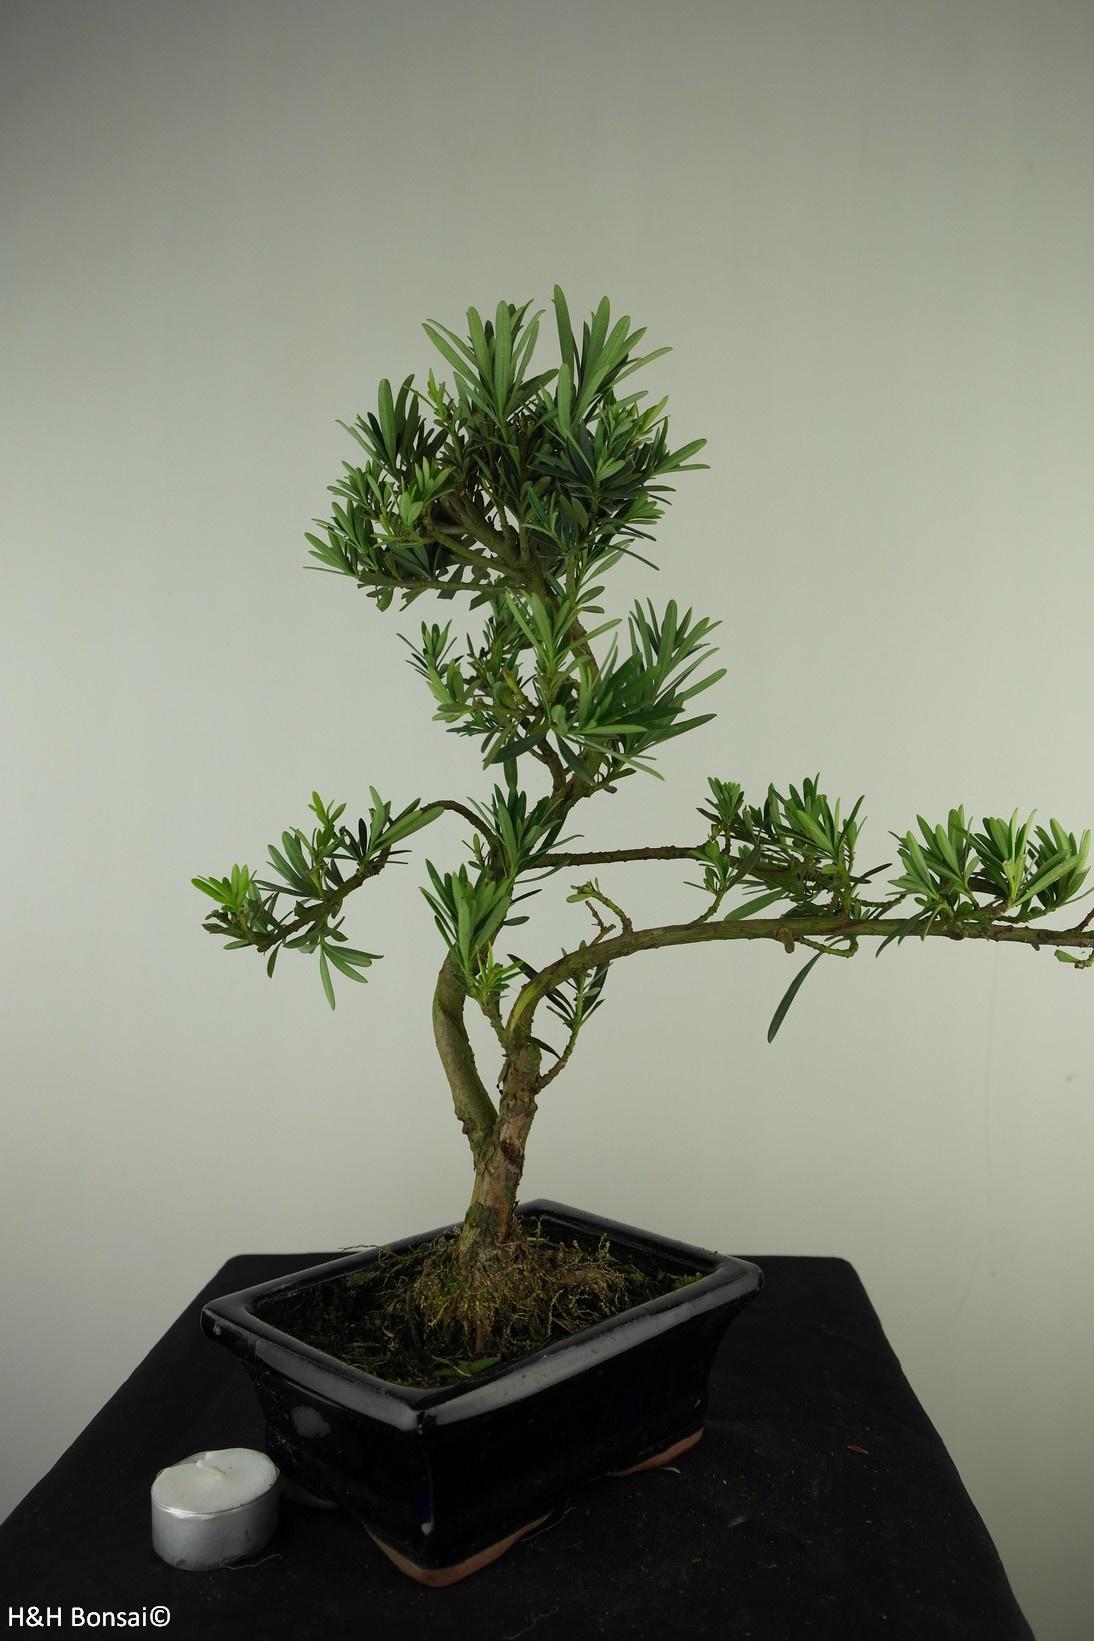 Bonsai Chin. Steineibe, Podocarpus, nr. 7717